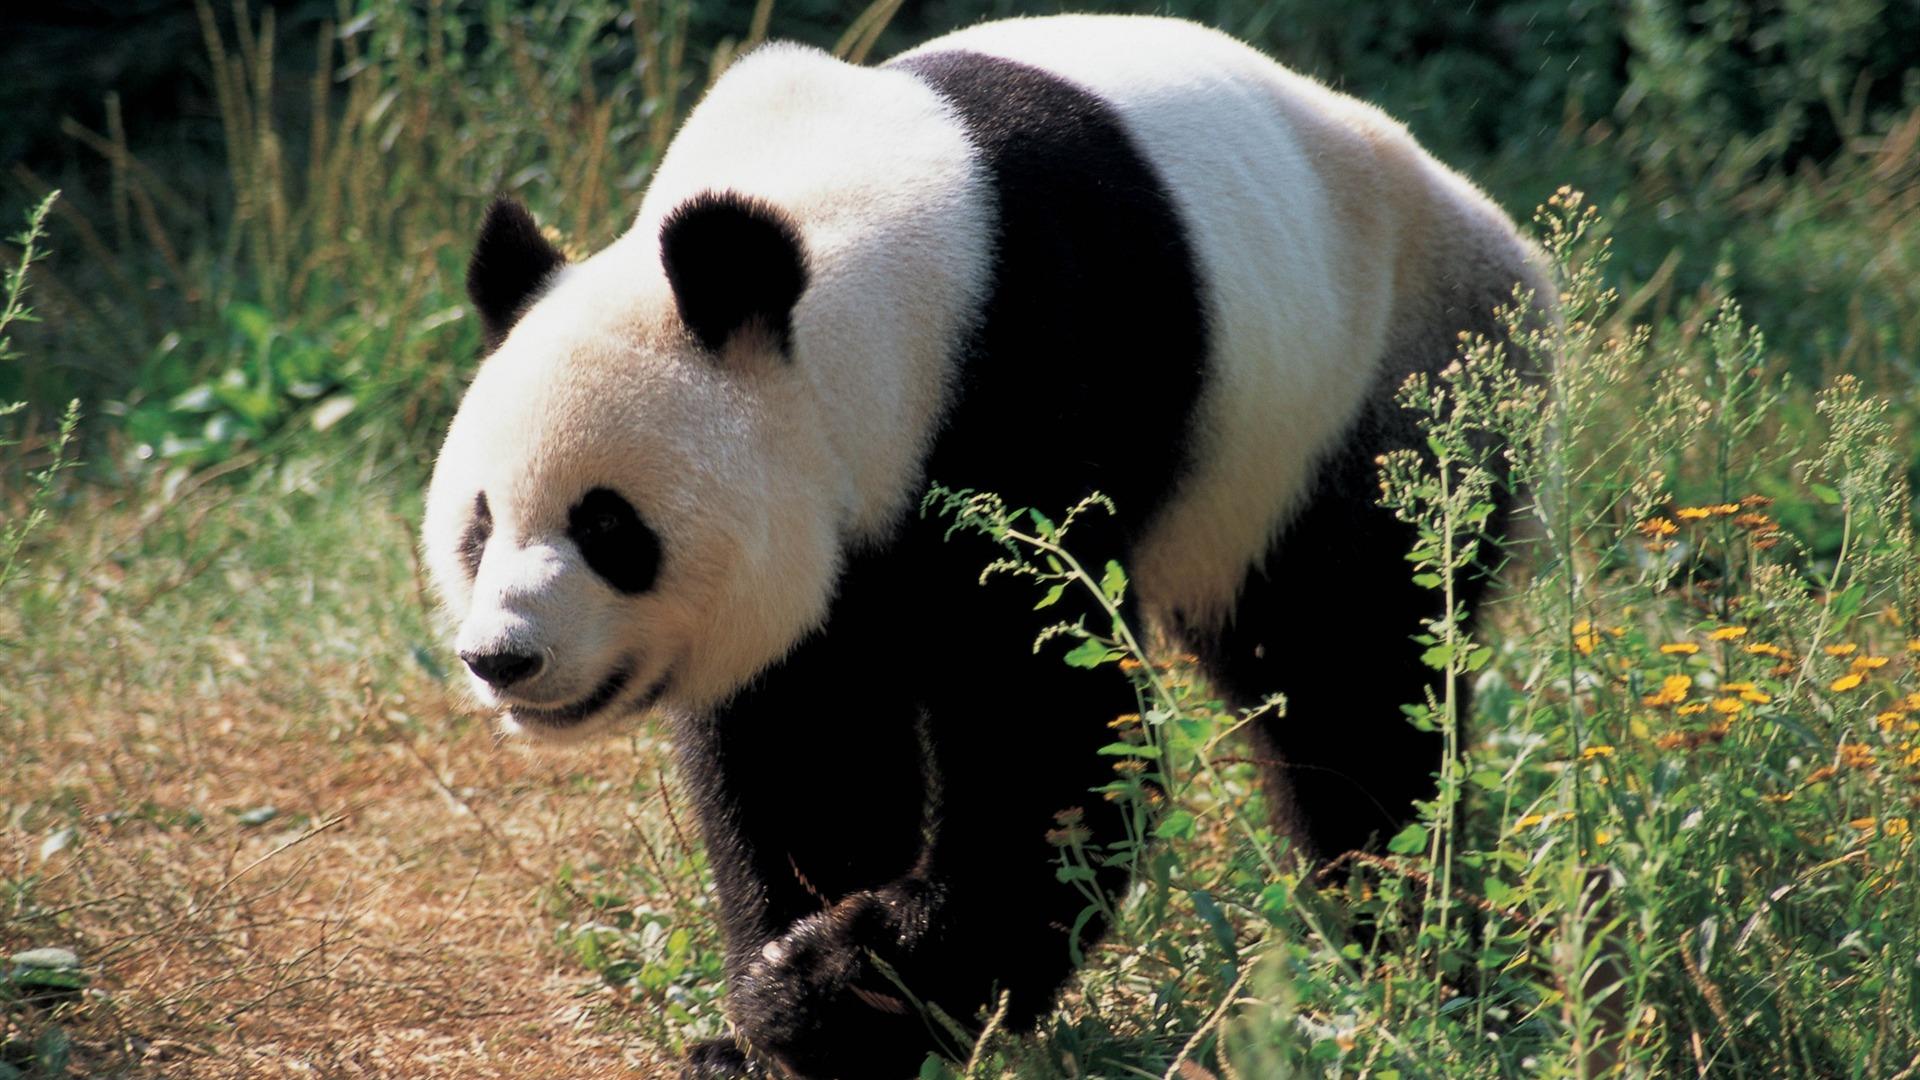 Download Wallpapers Download 2790x2547 Animals Grass: Panda Bear Grass-Animal Photo Desktop Wallpaper-1920x1080